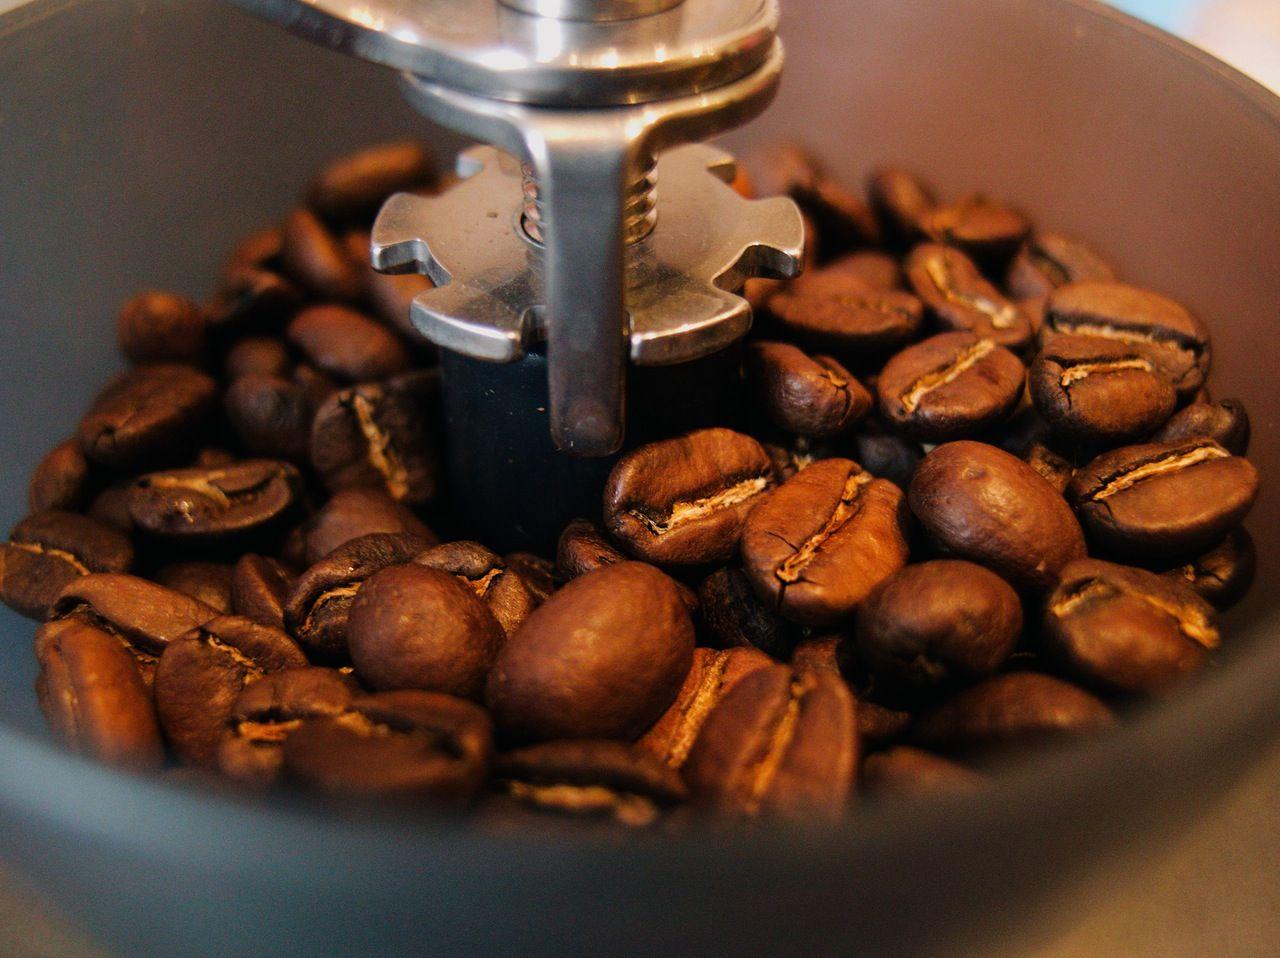 Granos de café en un molinillo